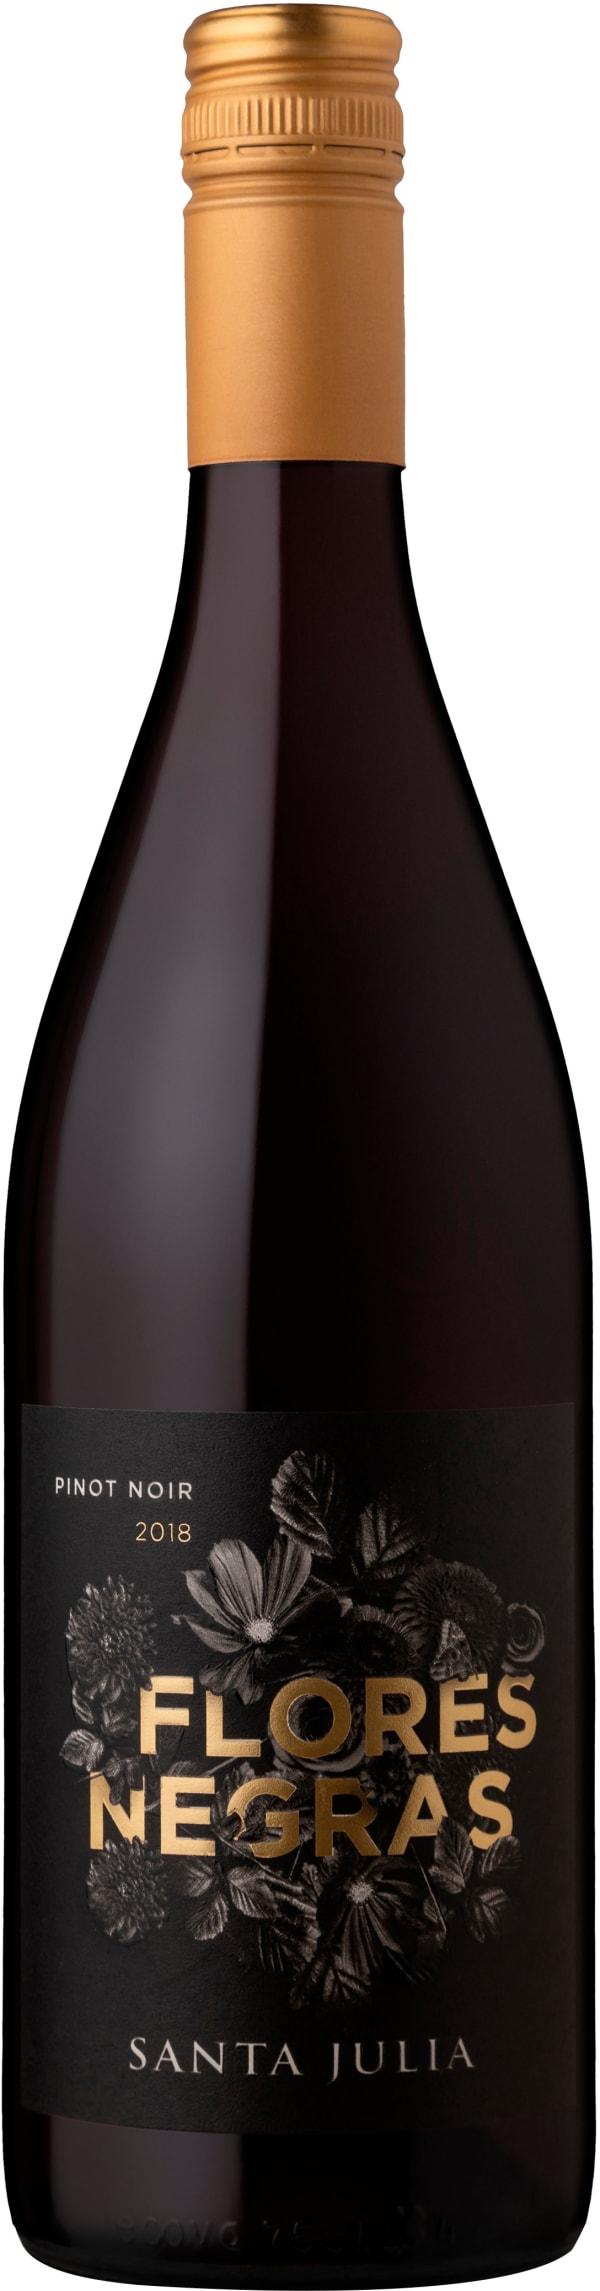 Santa Julia Pinot Noir Flores Negras 2018